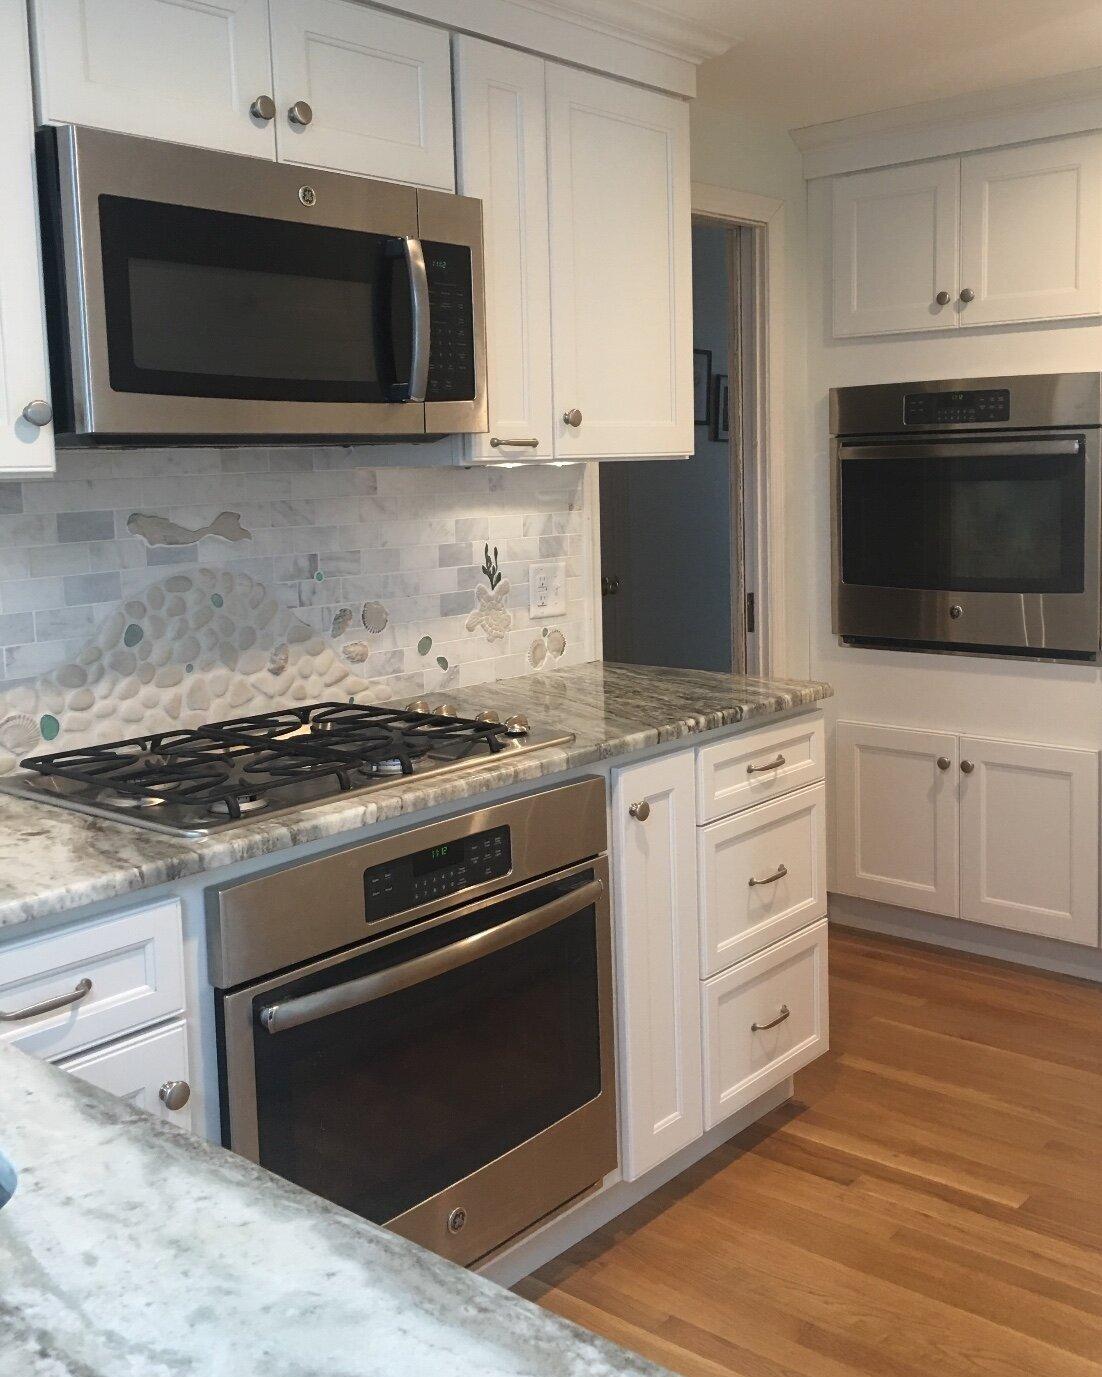 kitchen_remodel_6220.jpg